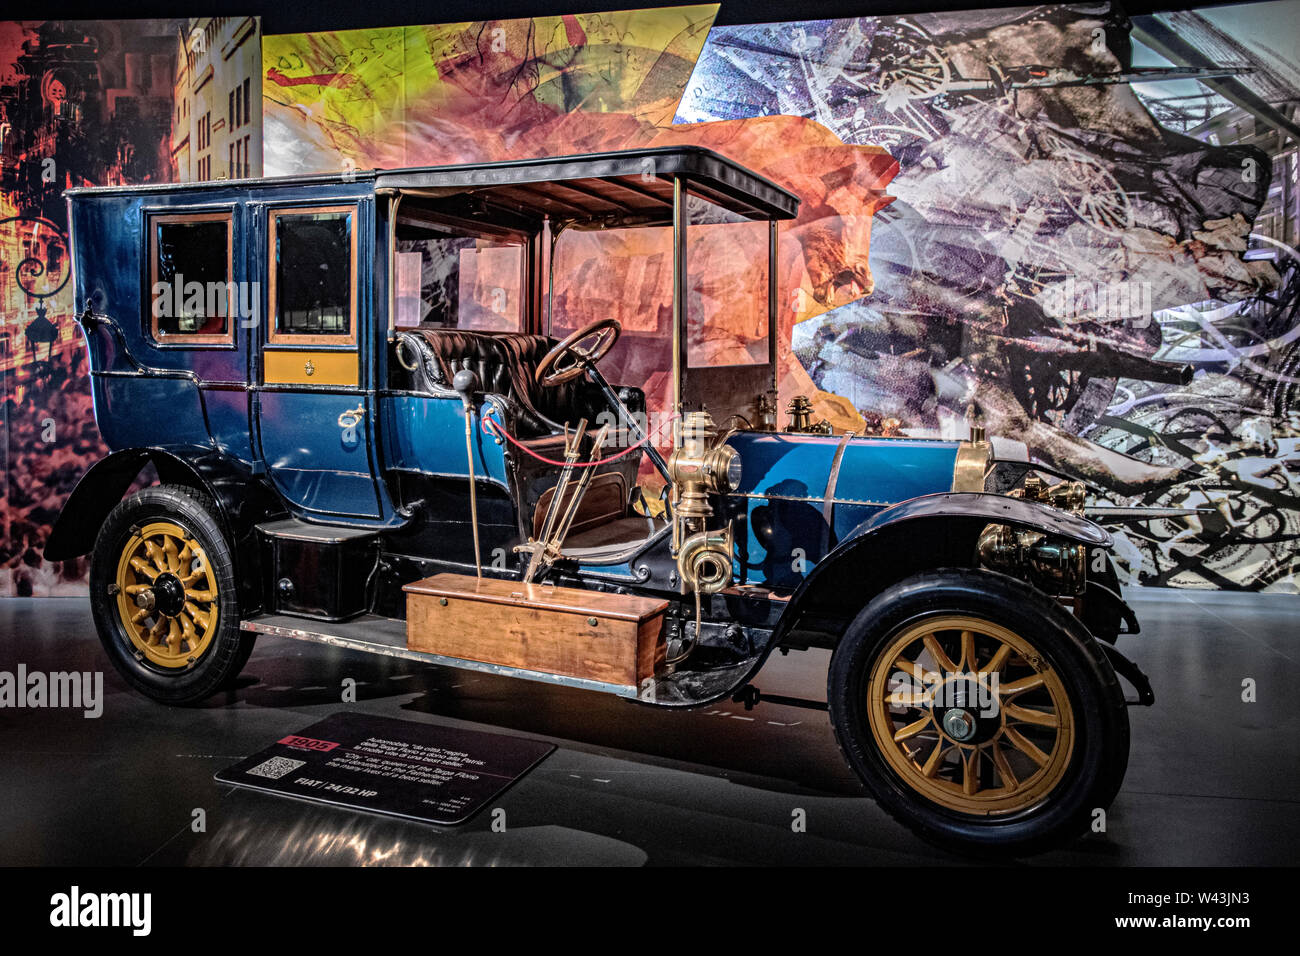 Italia Turín Piamonte Museo dell' Mauto Automonbile Torino ( 1905 ) - Italia - Fiat 24/32 HP - City car, Reina de la Targa Florio y donado a la patria: las muchas vidas de un best seller Foto de stock